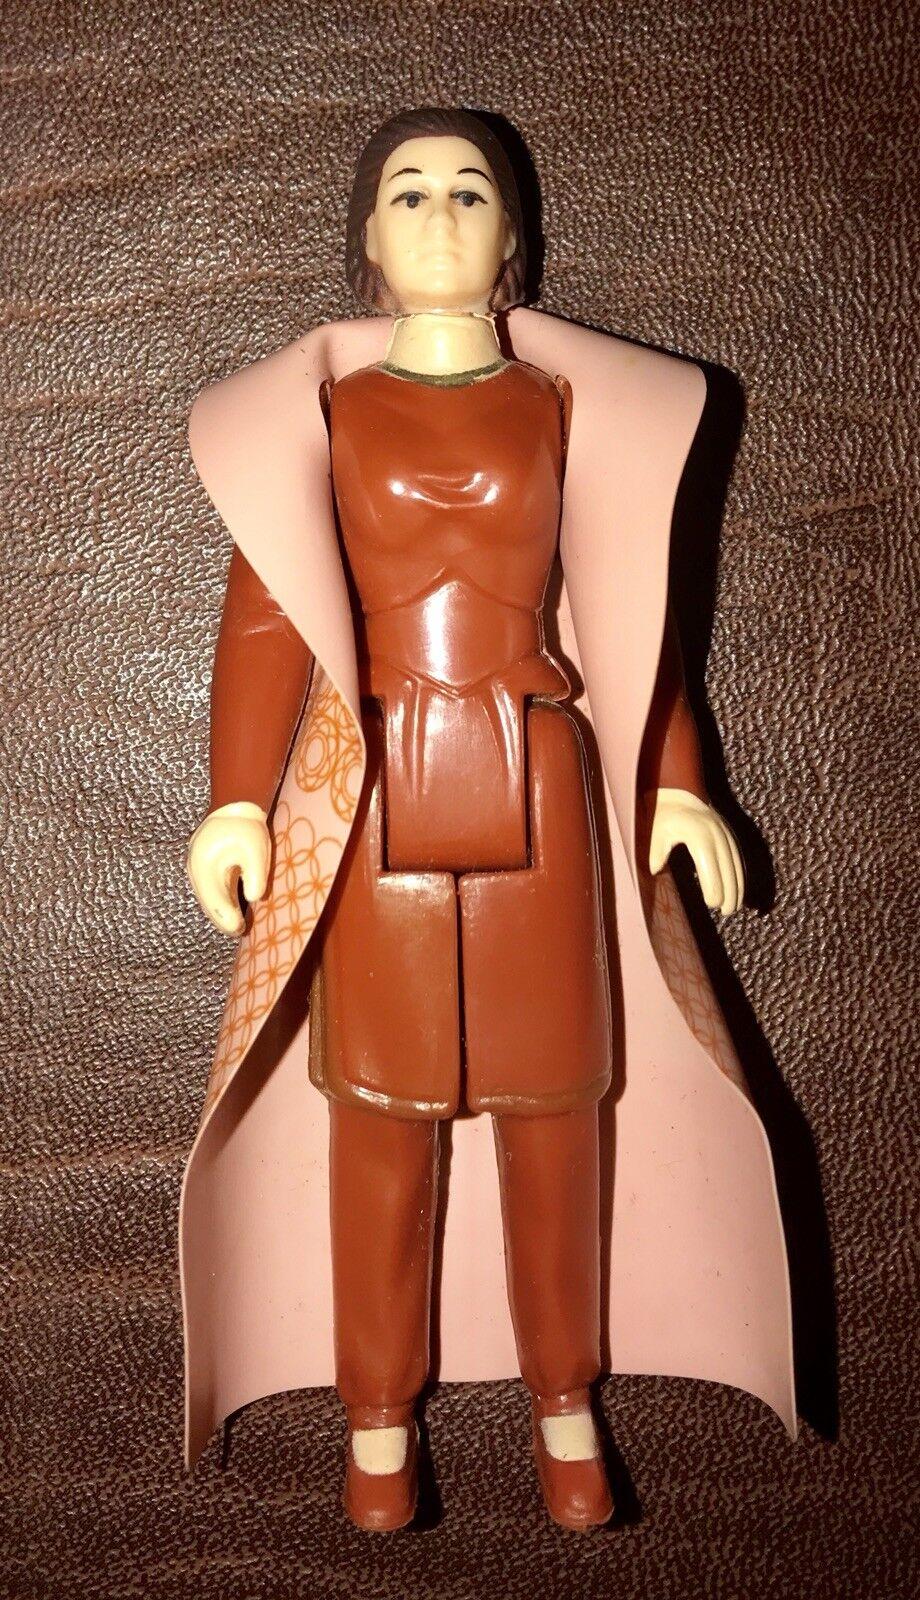 Jahrgang 1980 prinzessin leia bespin kleid cape 1980 hongkong